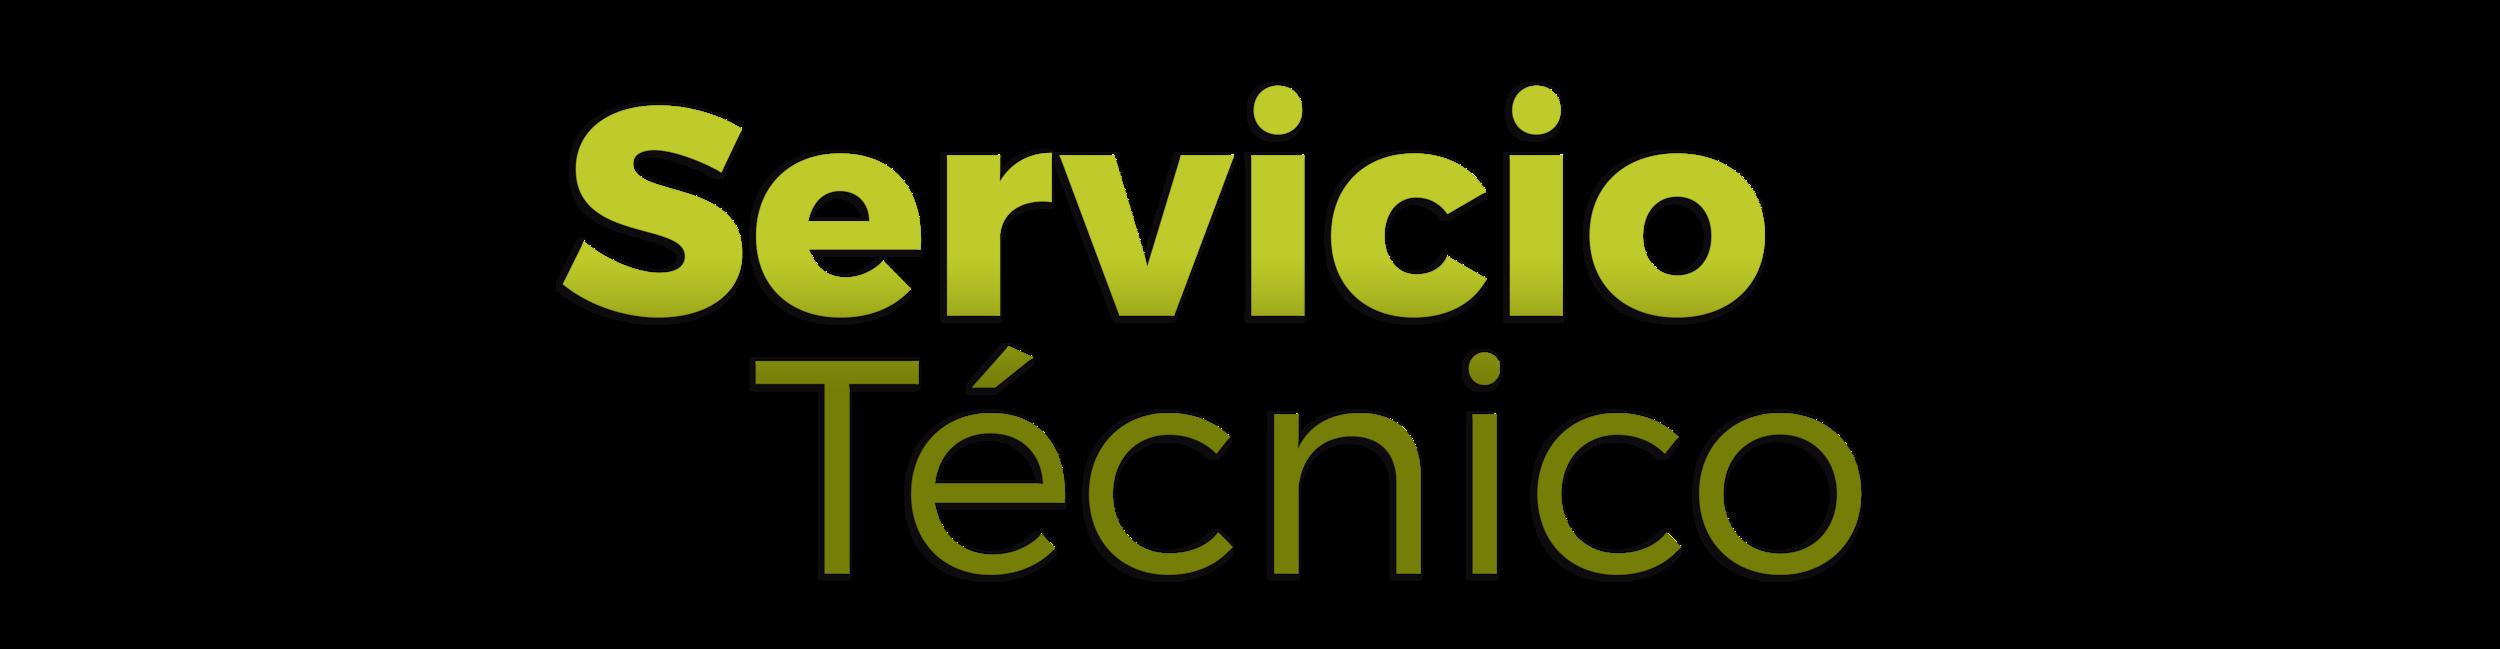 Servicio_T-13 copia.png